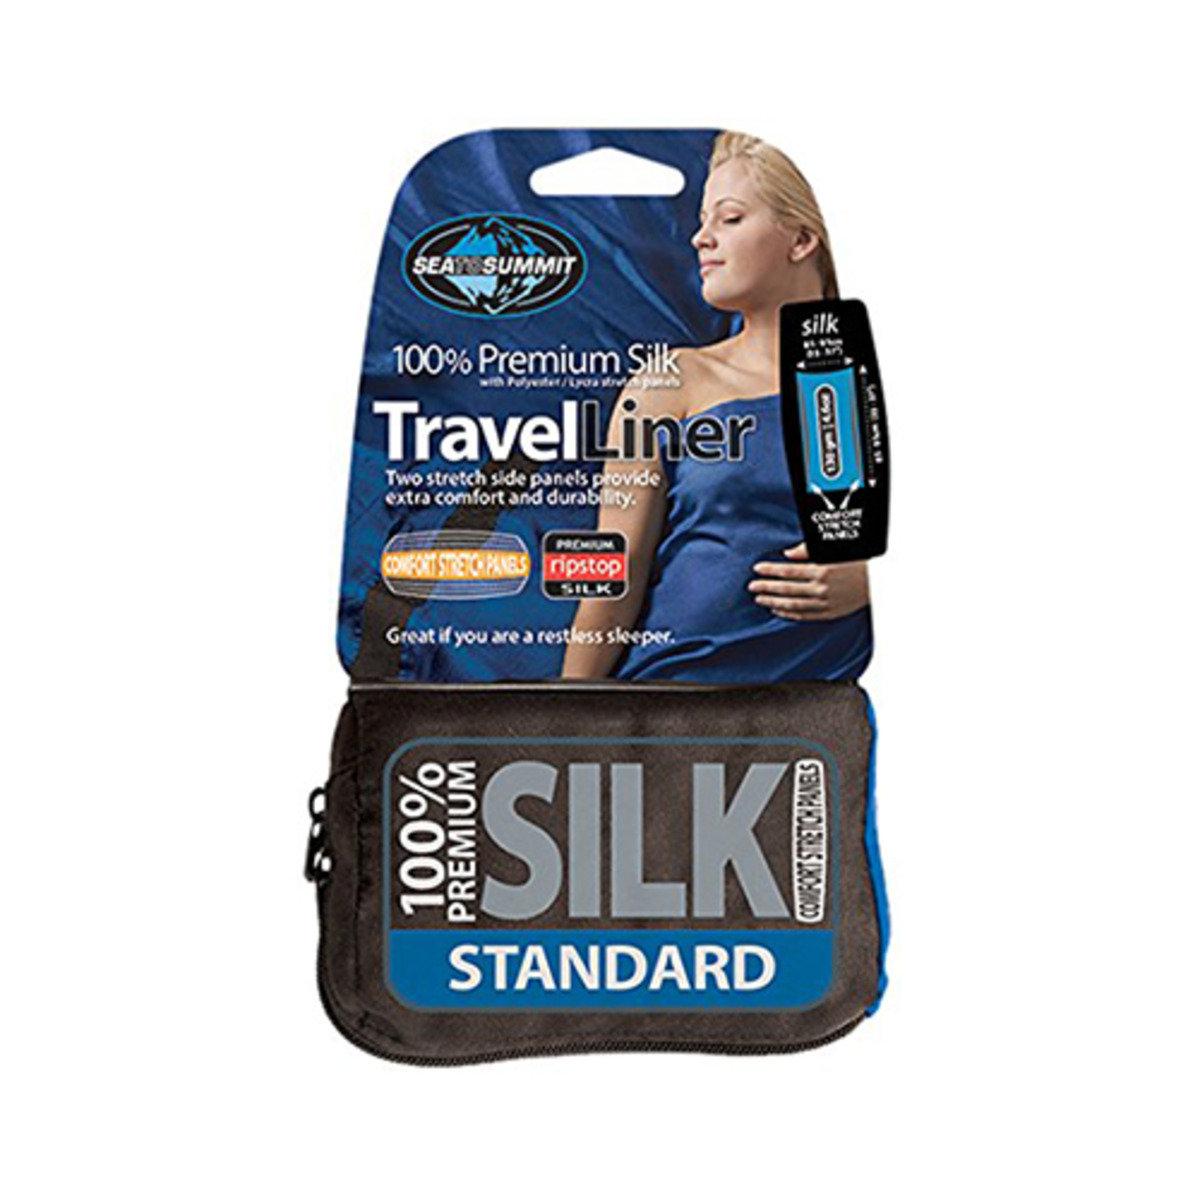 Silk Liner Stretch Std-Navy-ASILKCSSTDNB